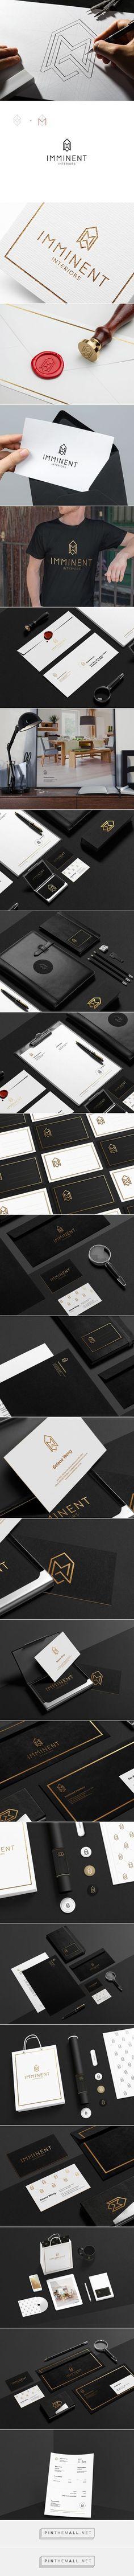 Imminent Interiors Architect Branding by Tomasz Mazurczak | Fivestar Branding – Design and Branding Agency & Inspiration Gallery